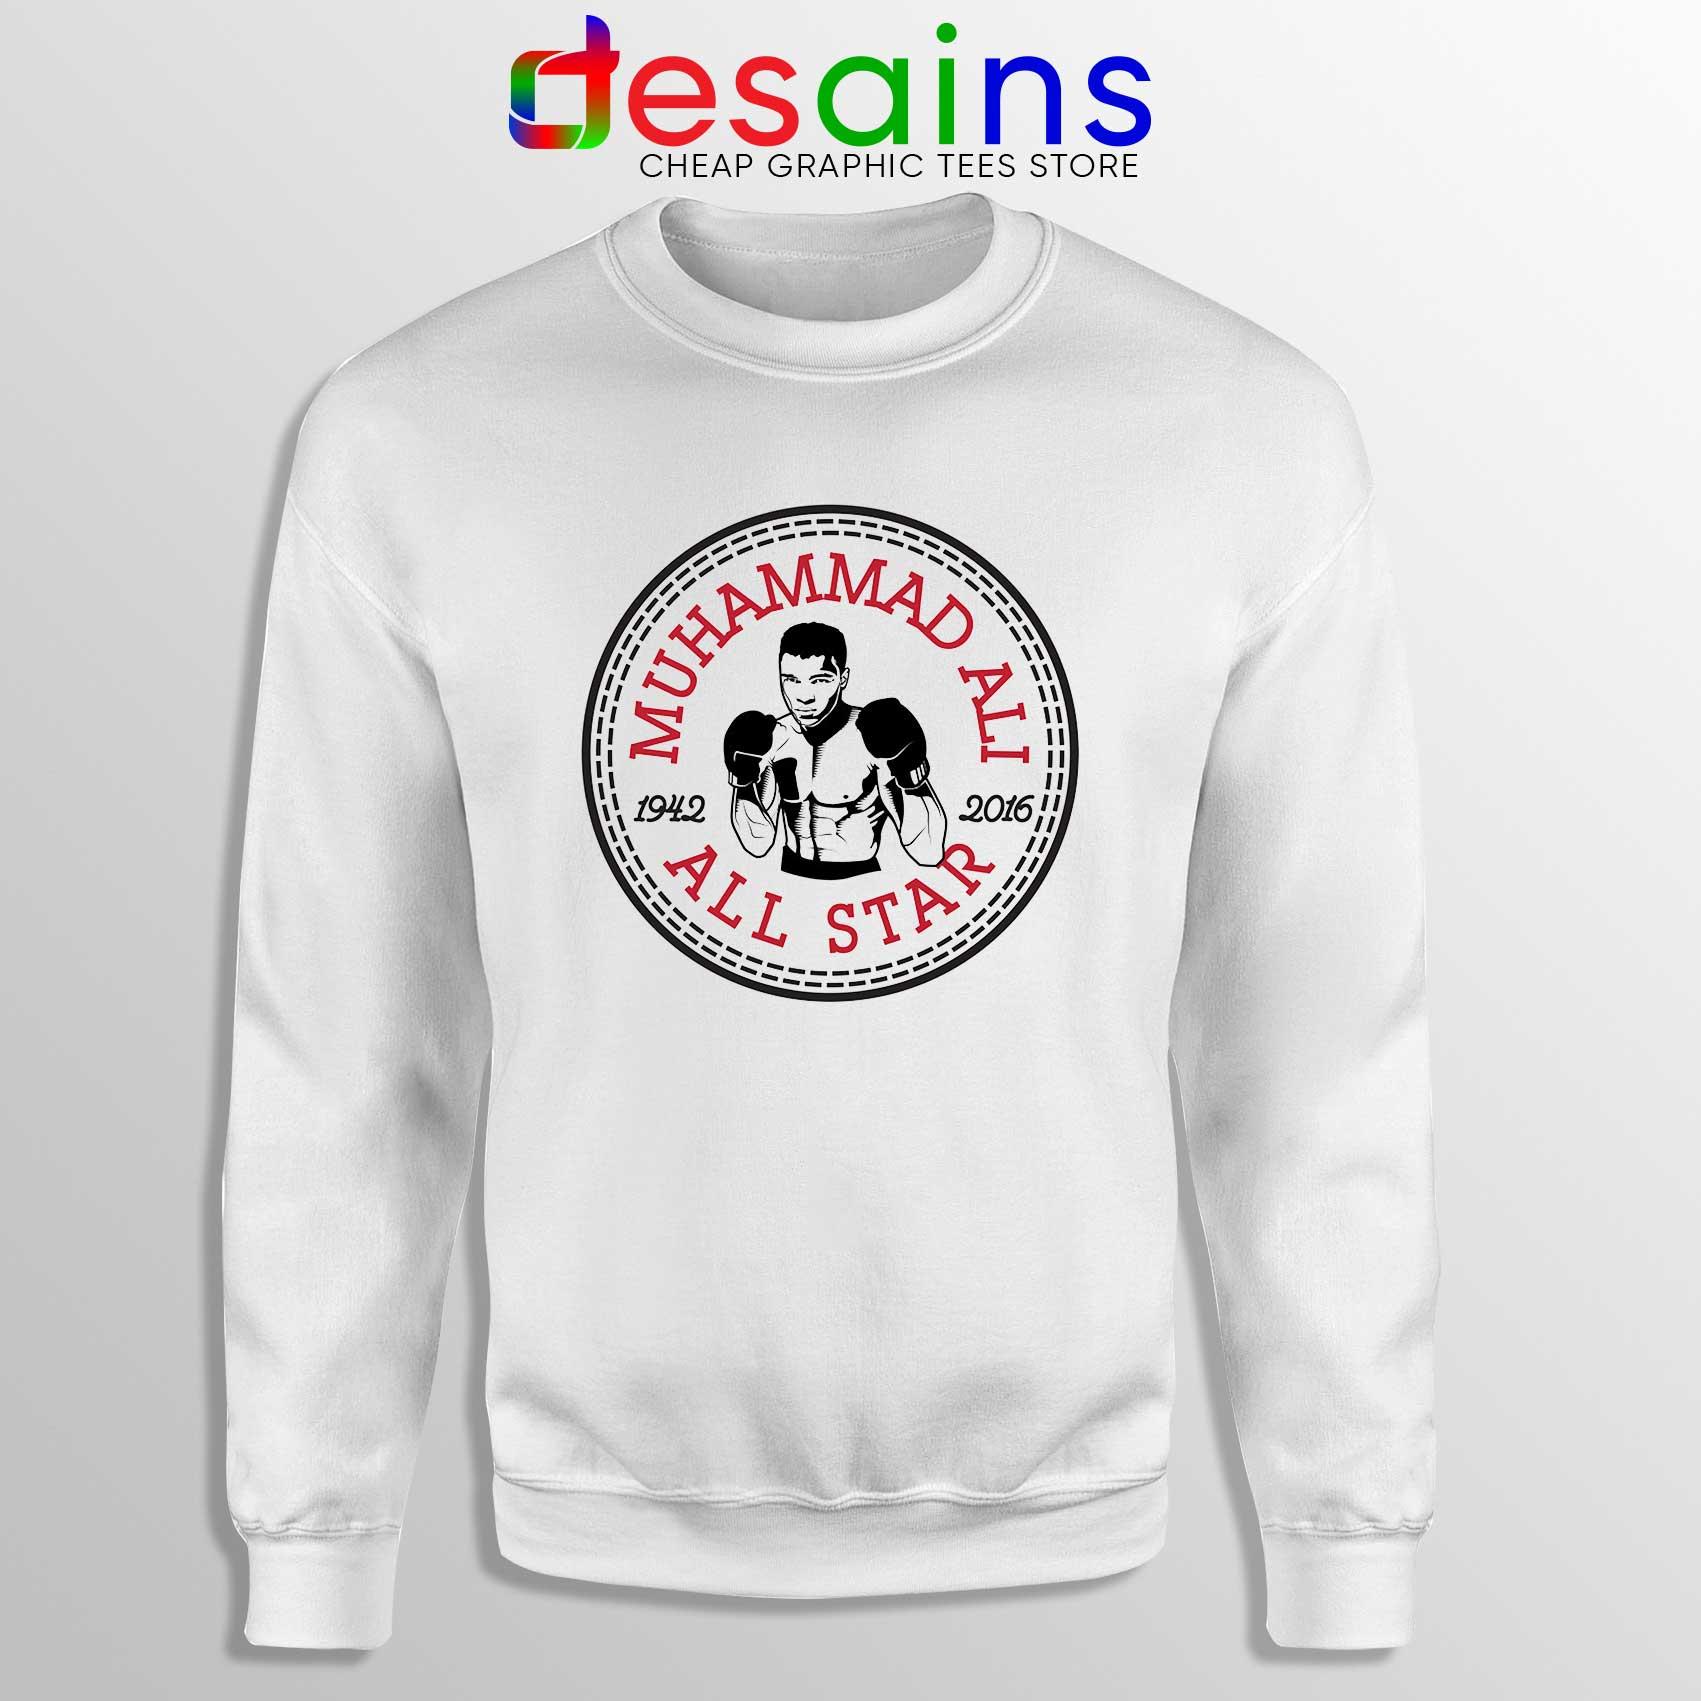 d784f52e342e Muhammad-Ali-All-Star-Sweatshirt-Converse-Logo-Crewneck-Size-S-3XL.jpg